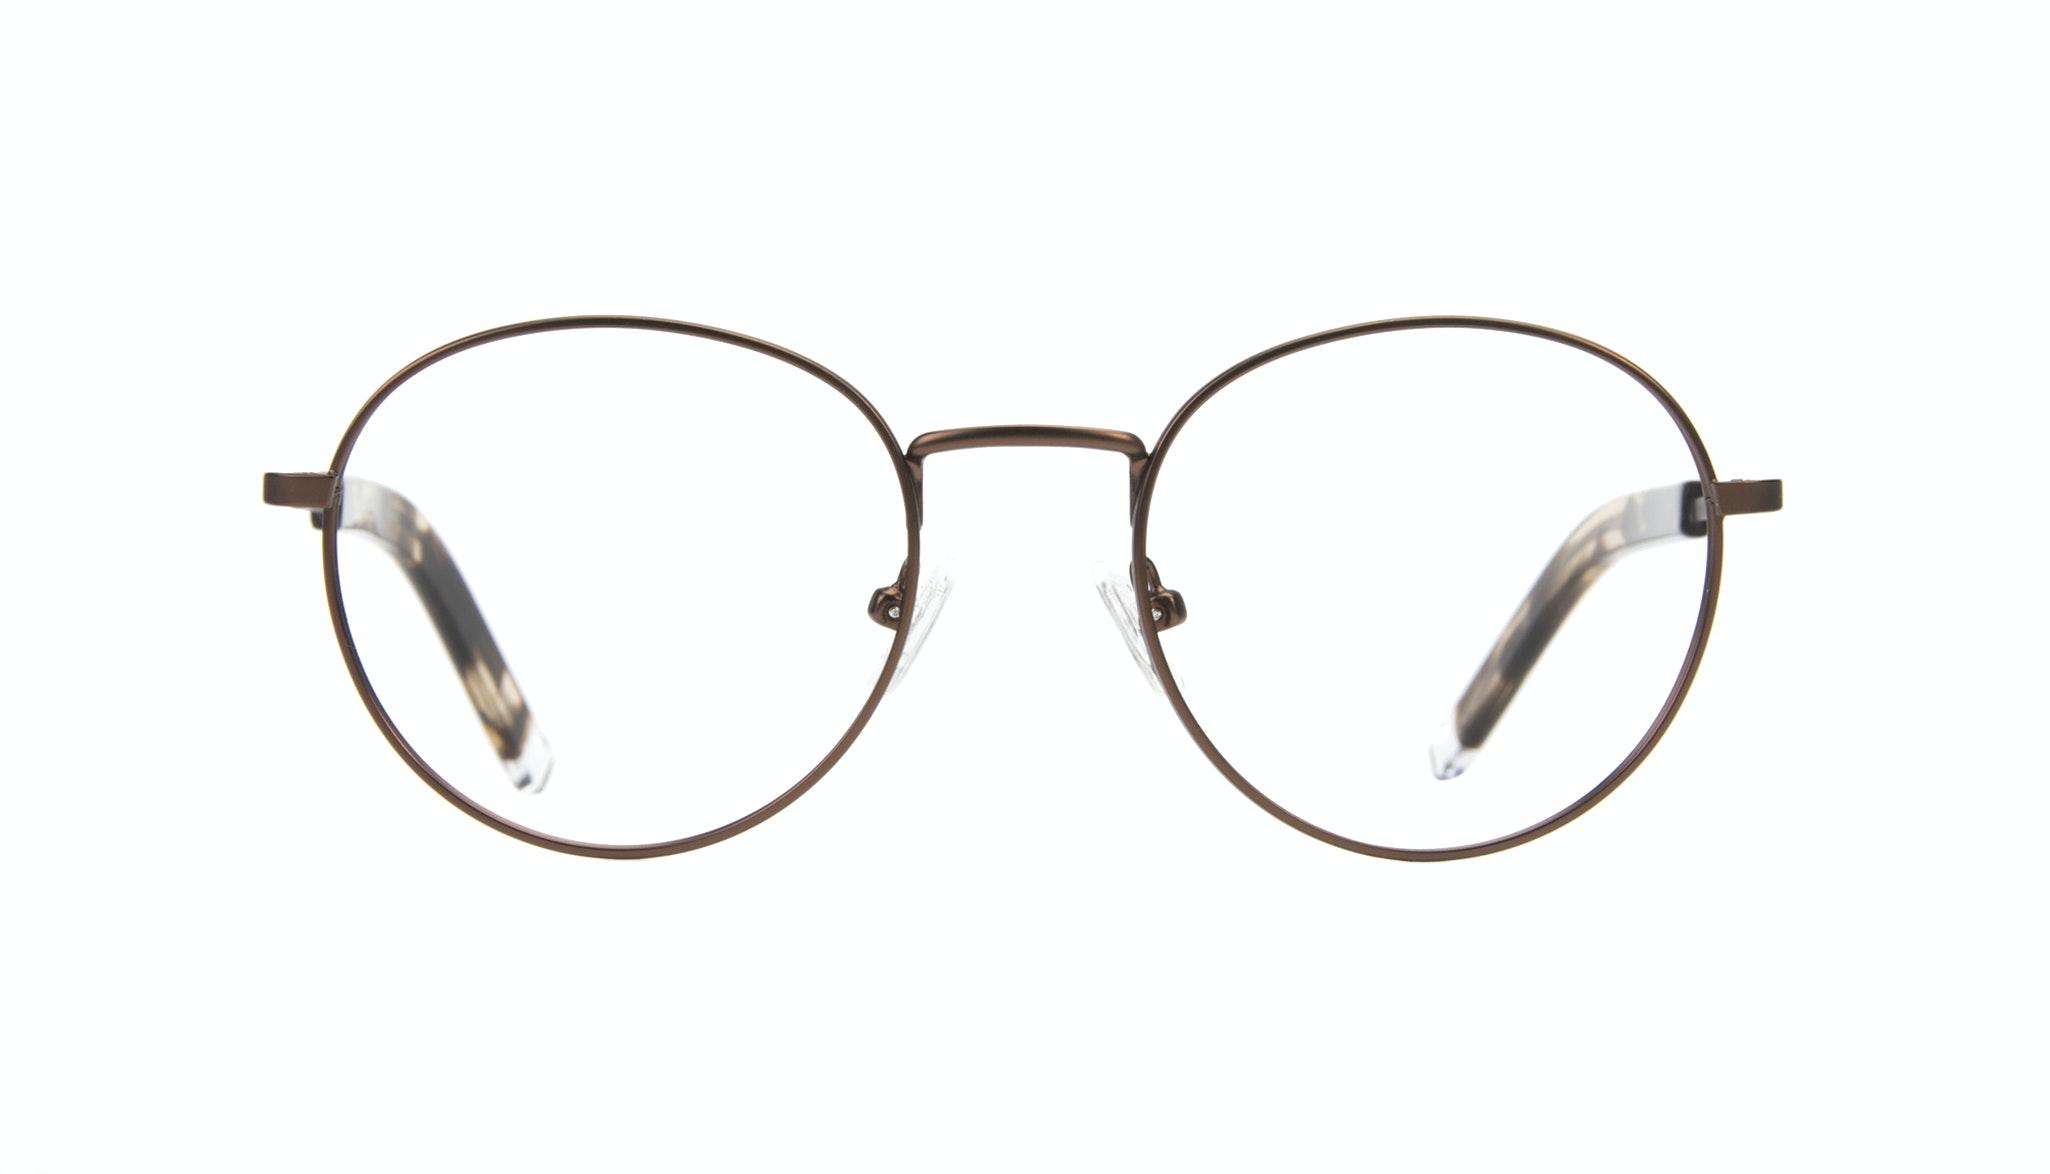 Affordable Fashion Glasses Round Eyeglasses Men Lean Mud